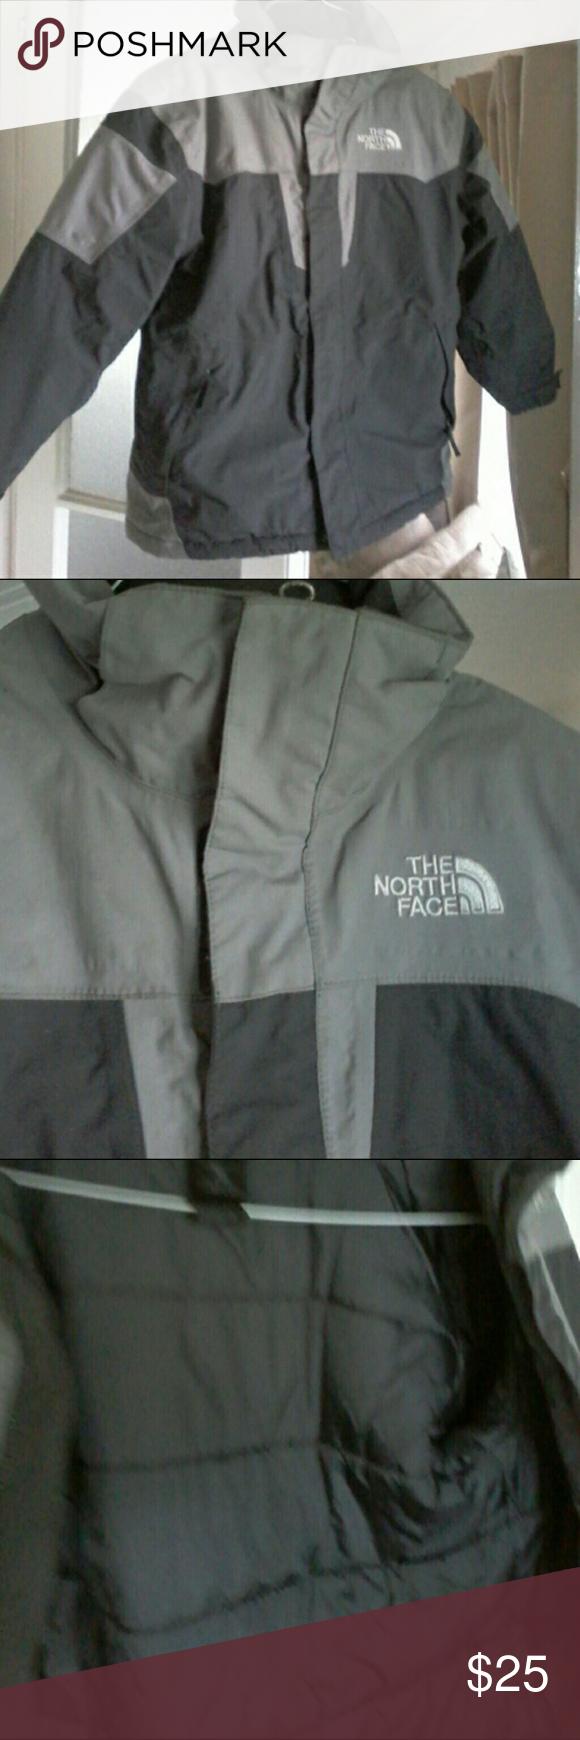 Boys North Face Coat 7 8 North Face Coat Grey North Face Coat North Face Jacket [ 1740 x 580 Pixel ]